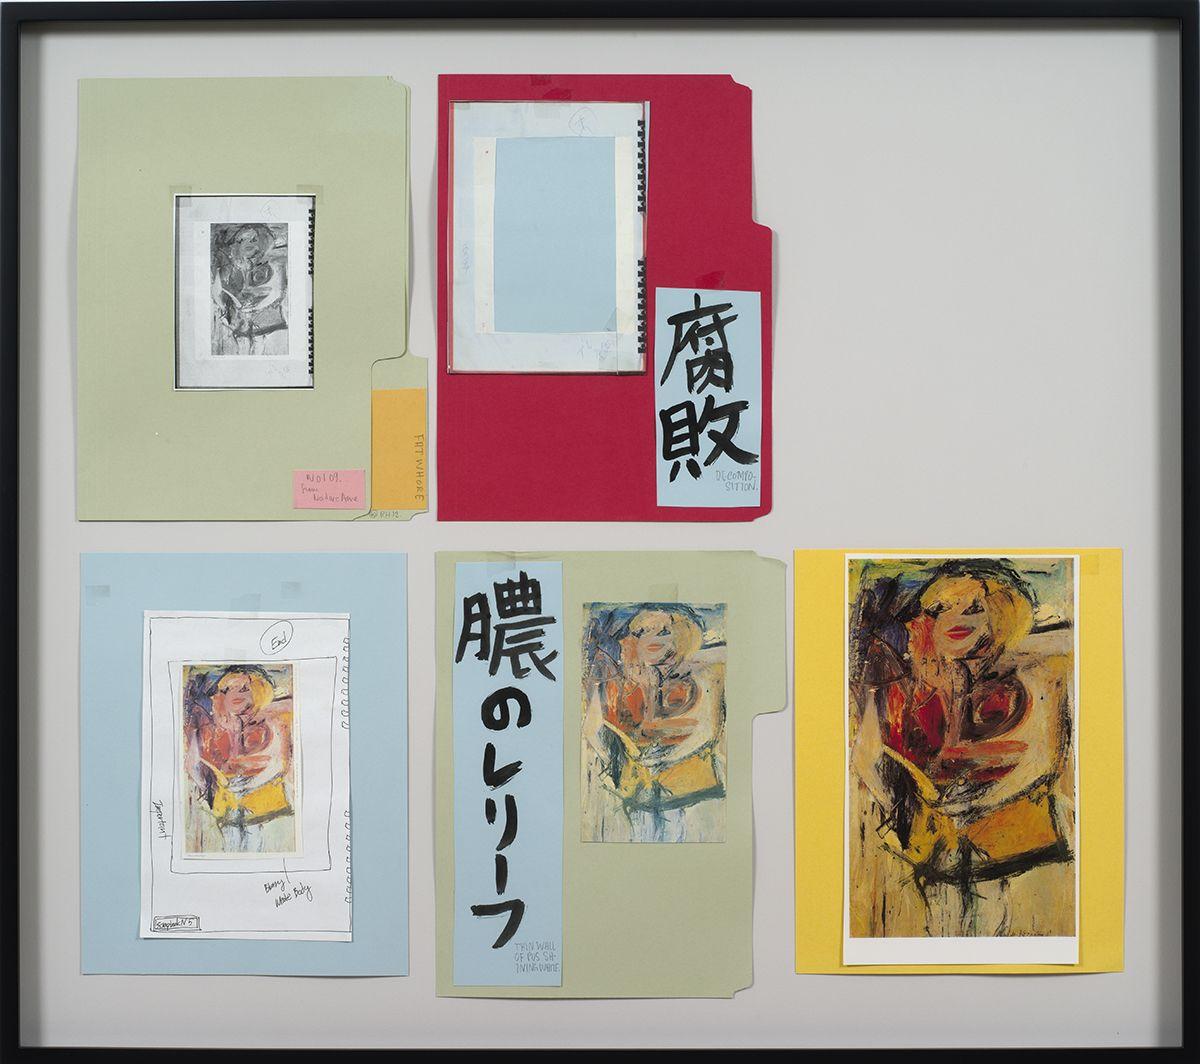 Ankoku 60 (Resource folder: Fat whore), 2012, Collage, 27 1/2 x 31 1/8 x 1 1/2 inches (69.9 x 79.1 x 3.8 cm)